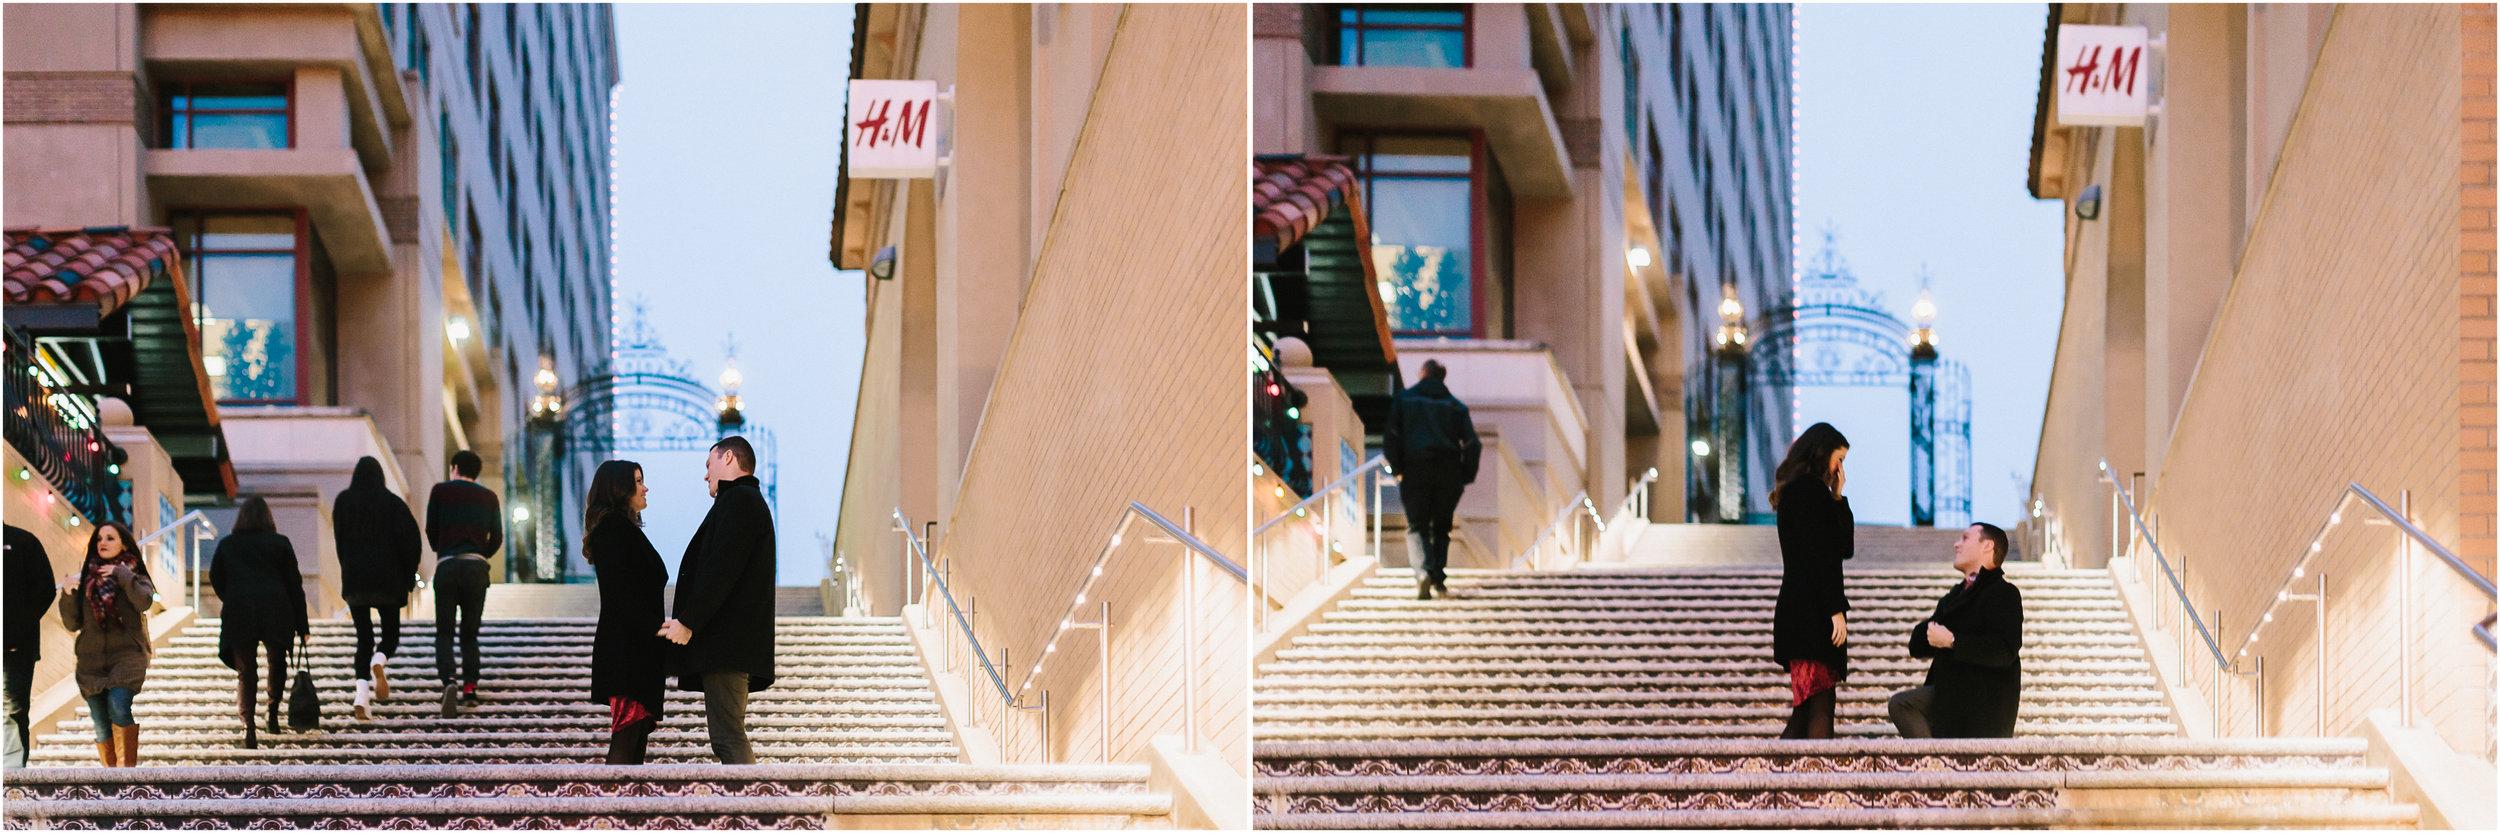 alyssa barletter photography christmas winter wedding proposal plaza lights plaza stairs she said yes-1.jpg